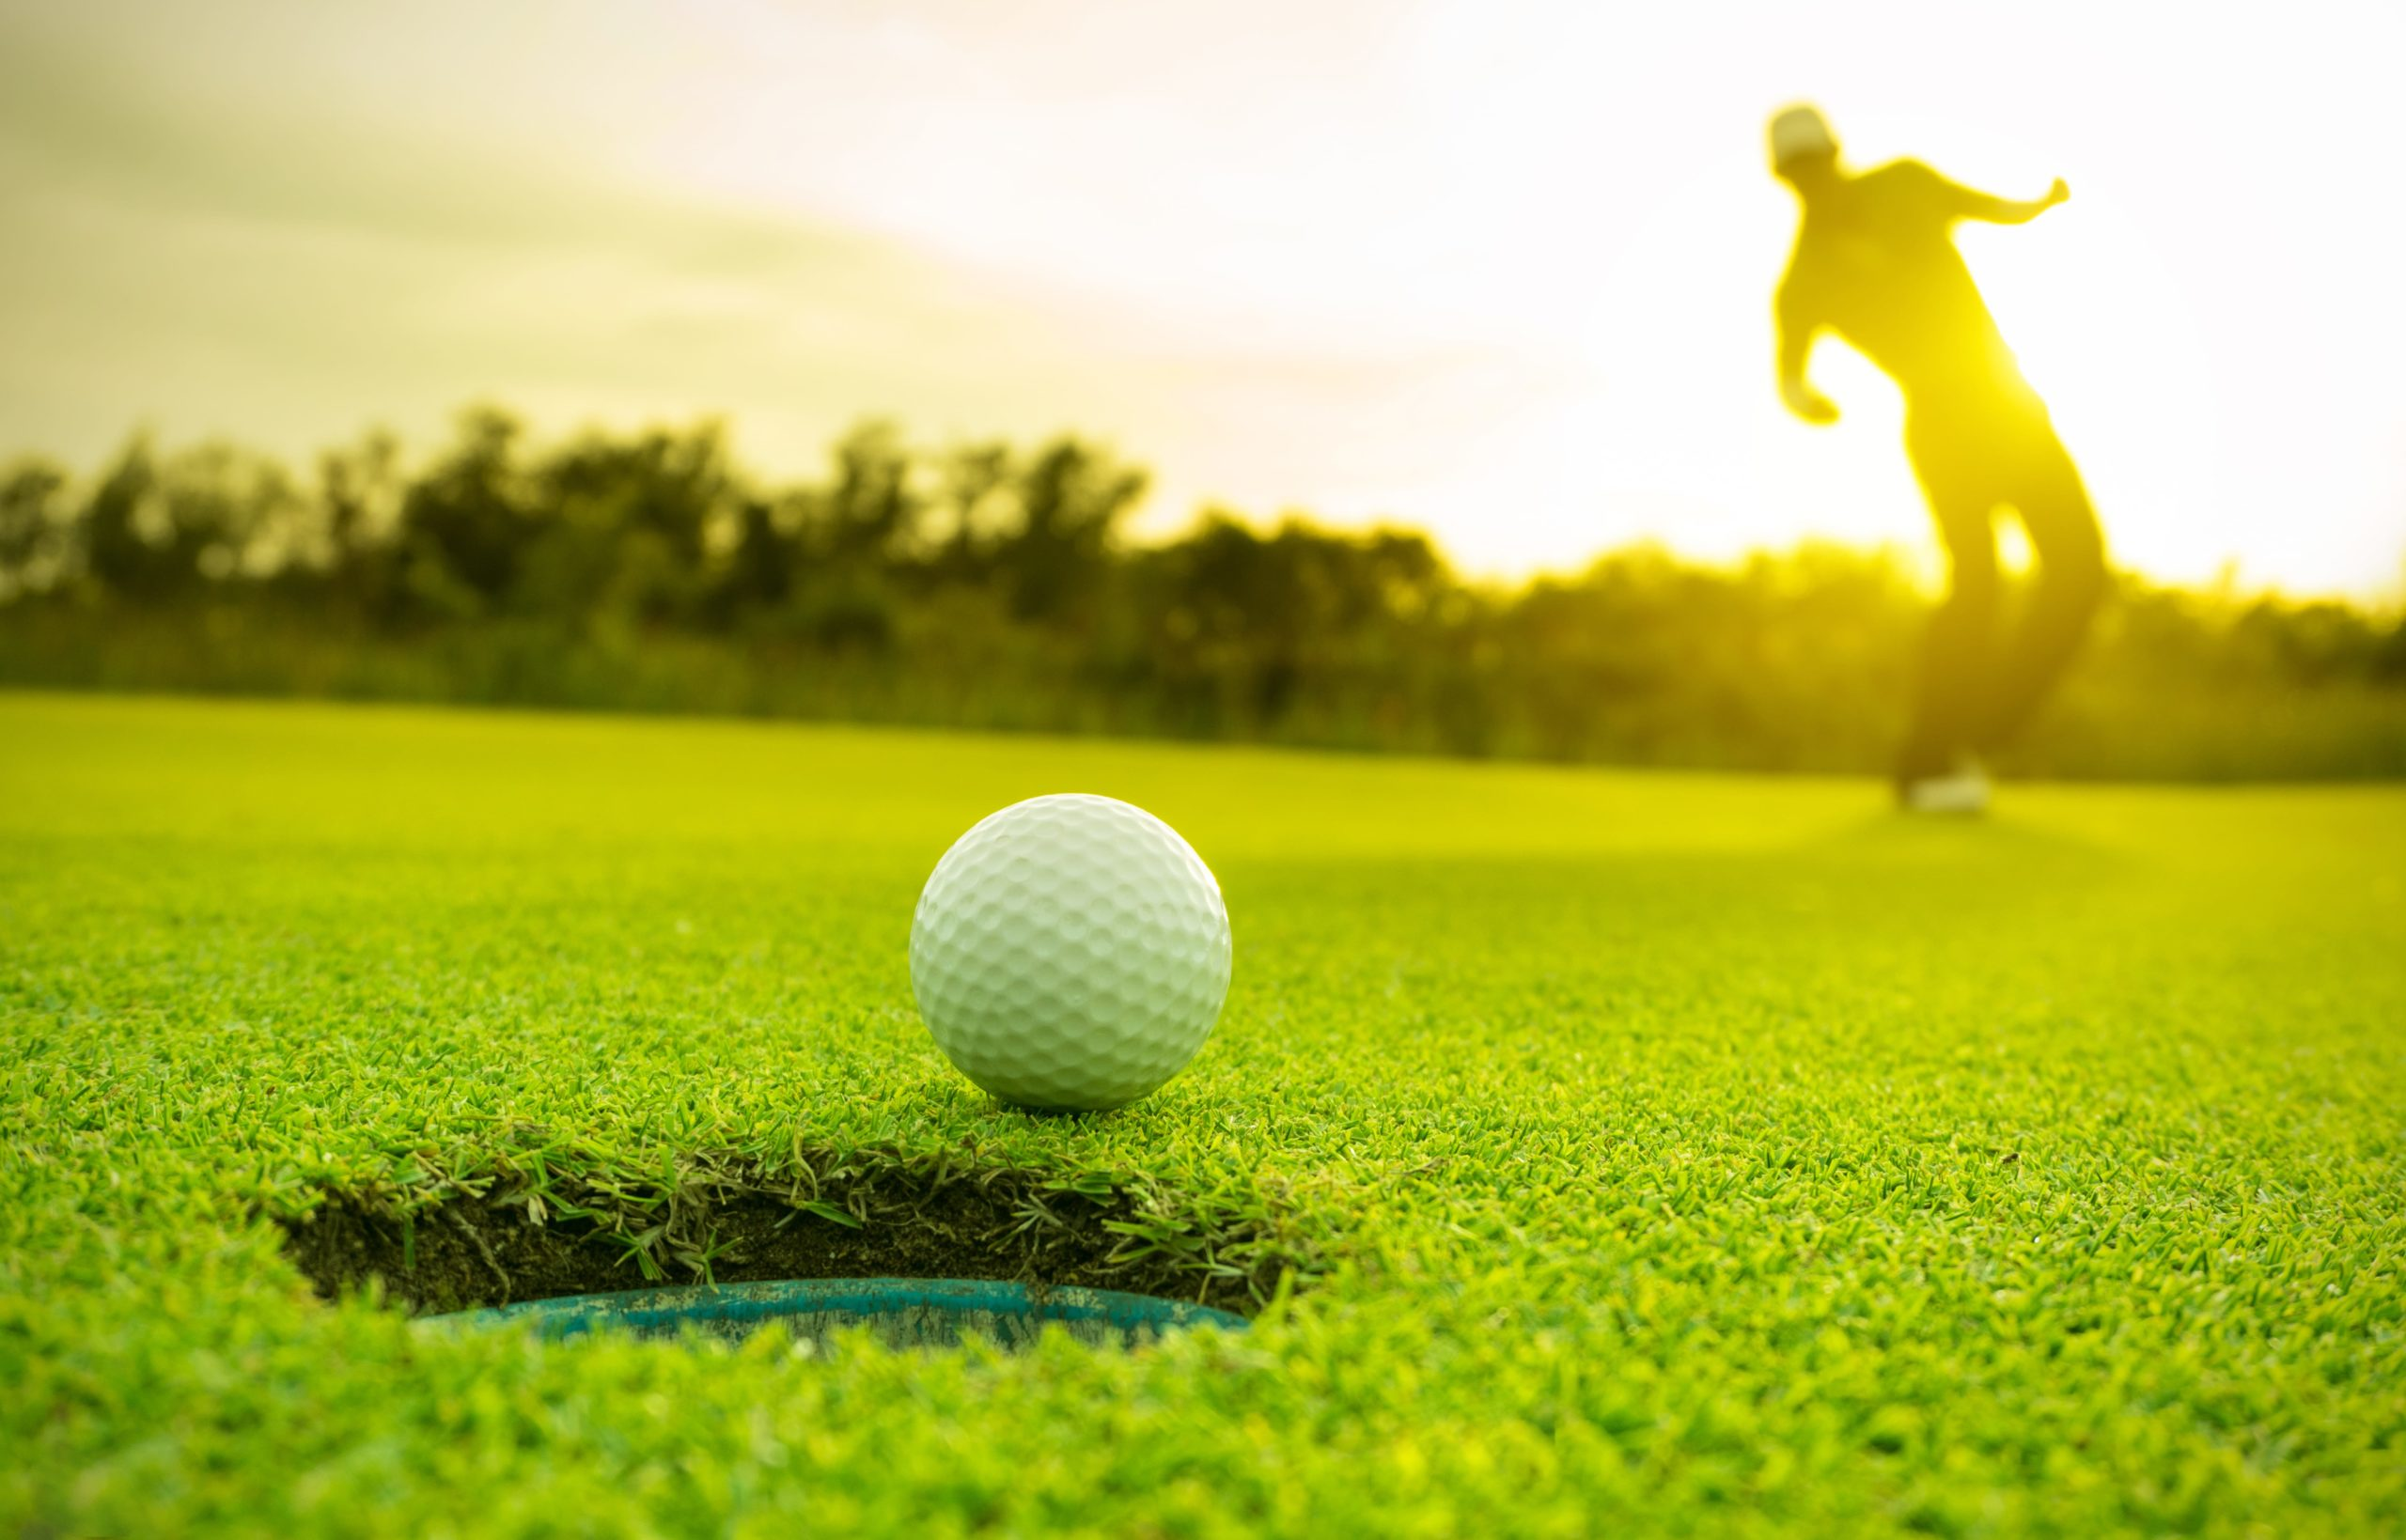 Golfer making a long putt on the green